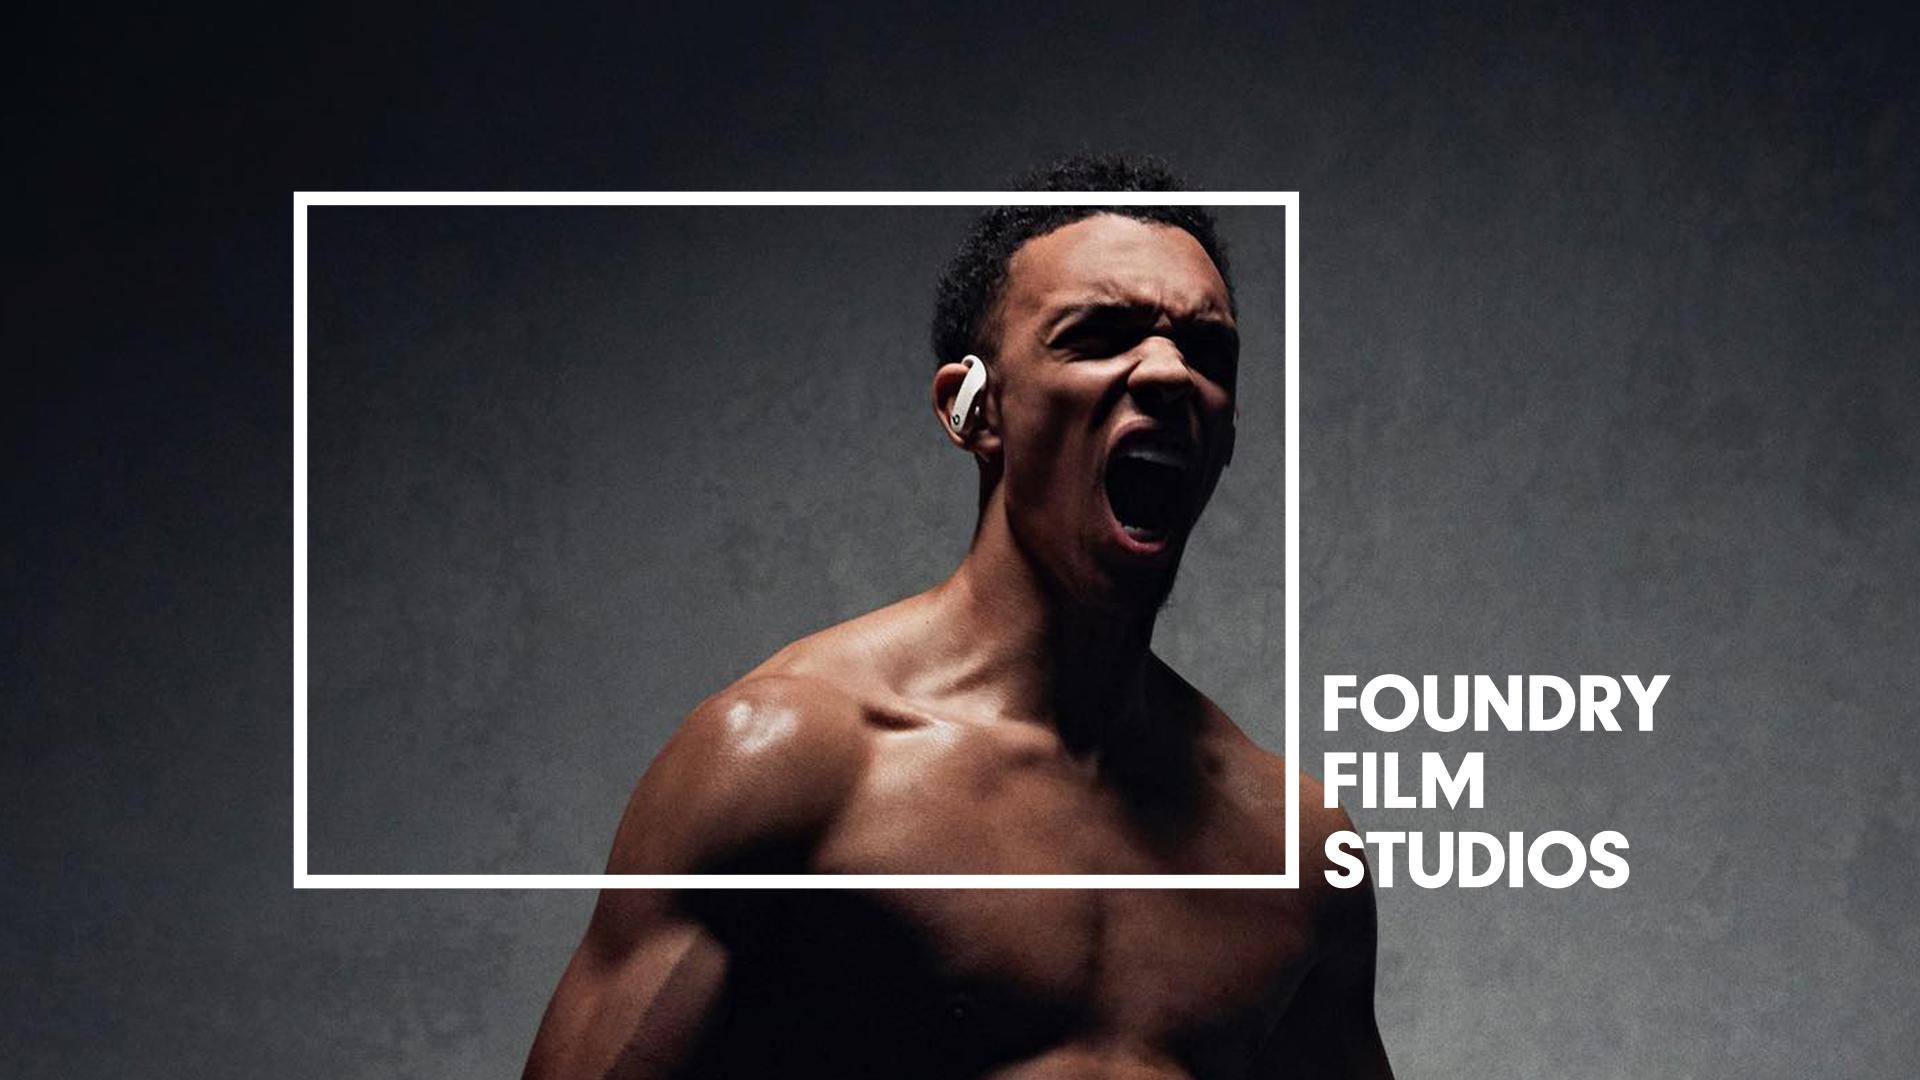 FoundryFilmStudios-WhiteLogoThumbs02